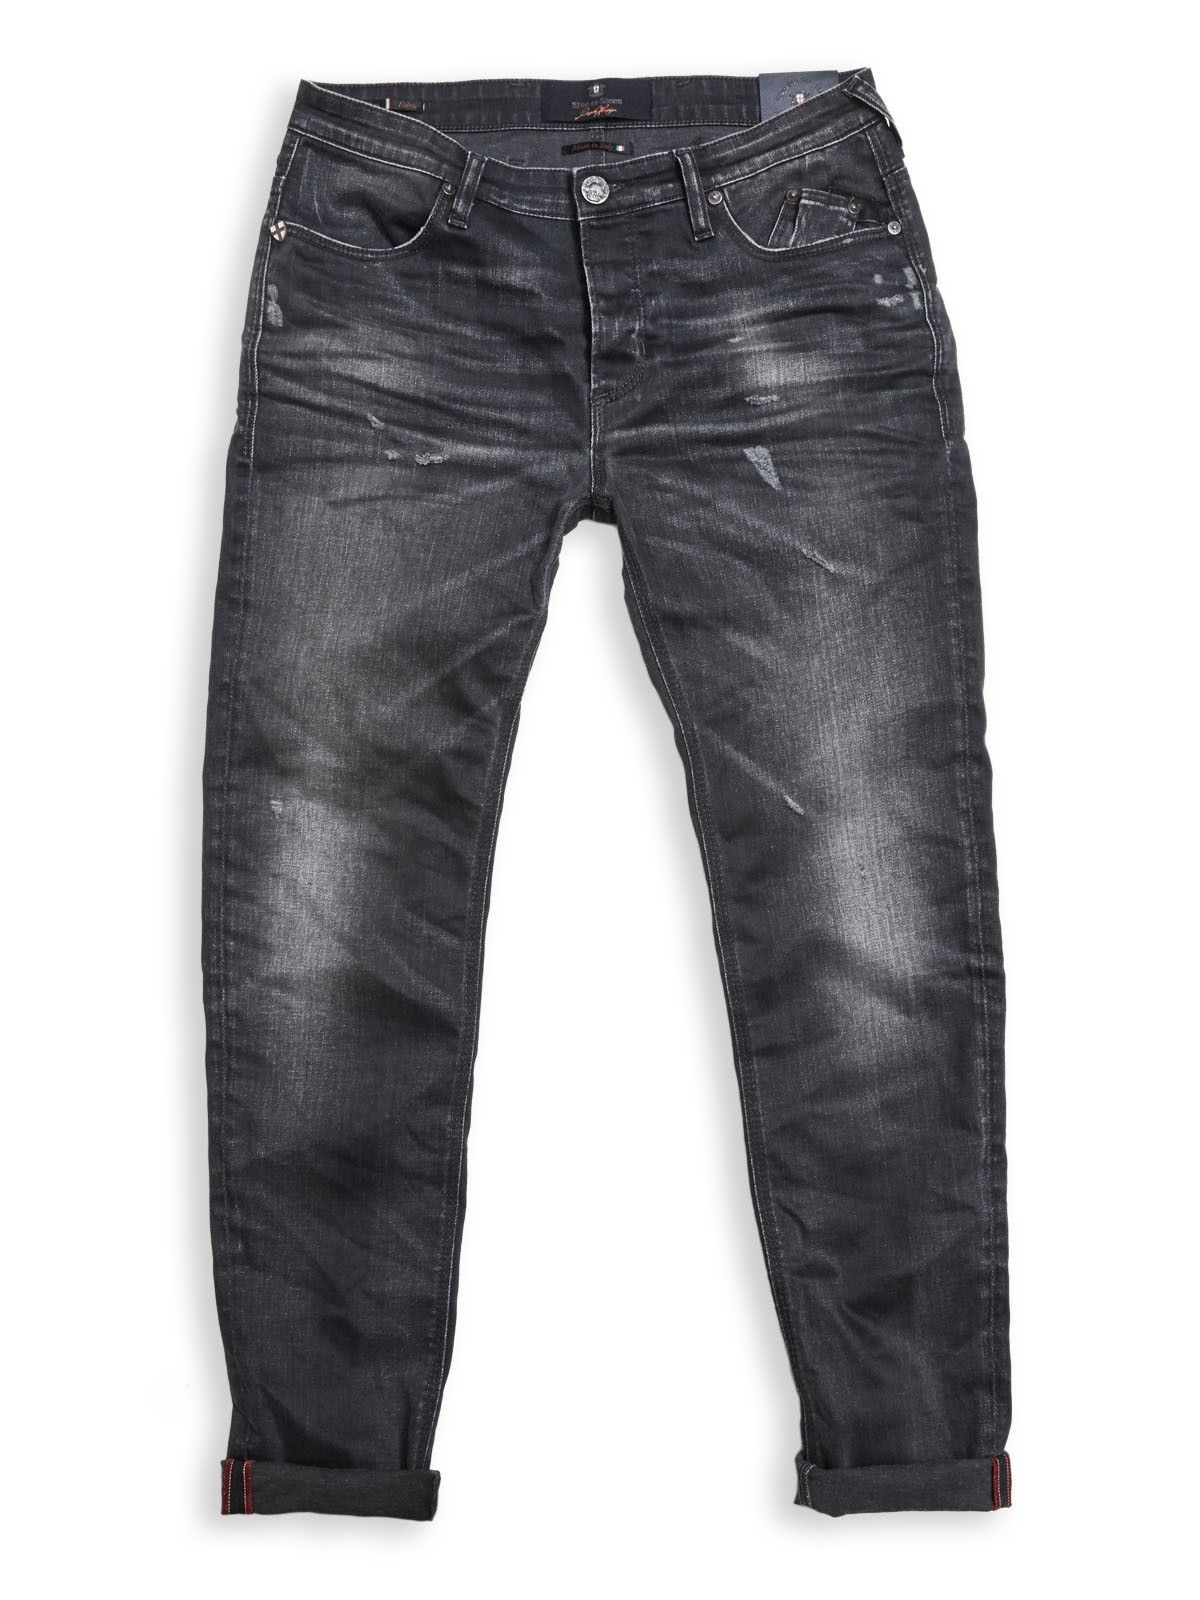 BLUE DE GENES - Herren Hose - Repi Cana Jeans - Dark Grey